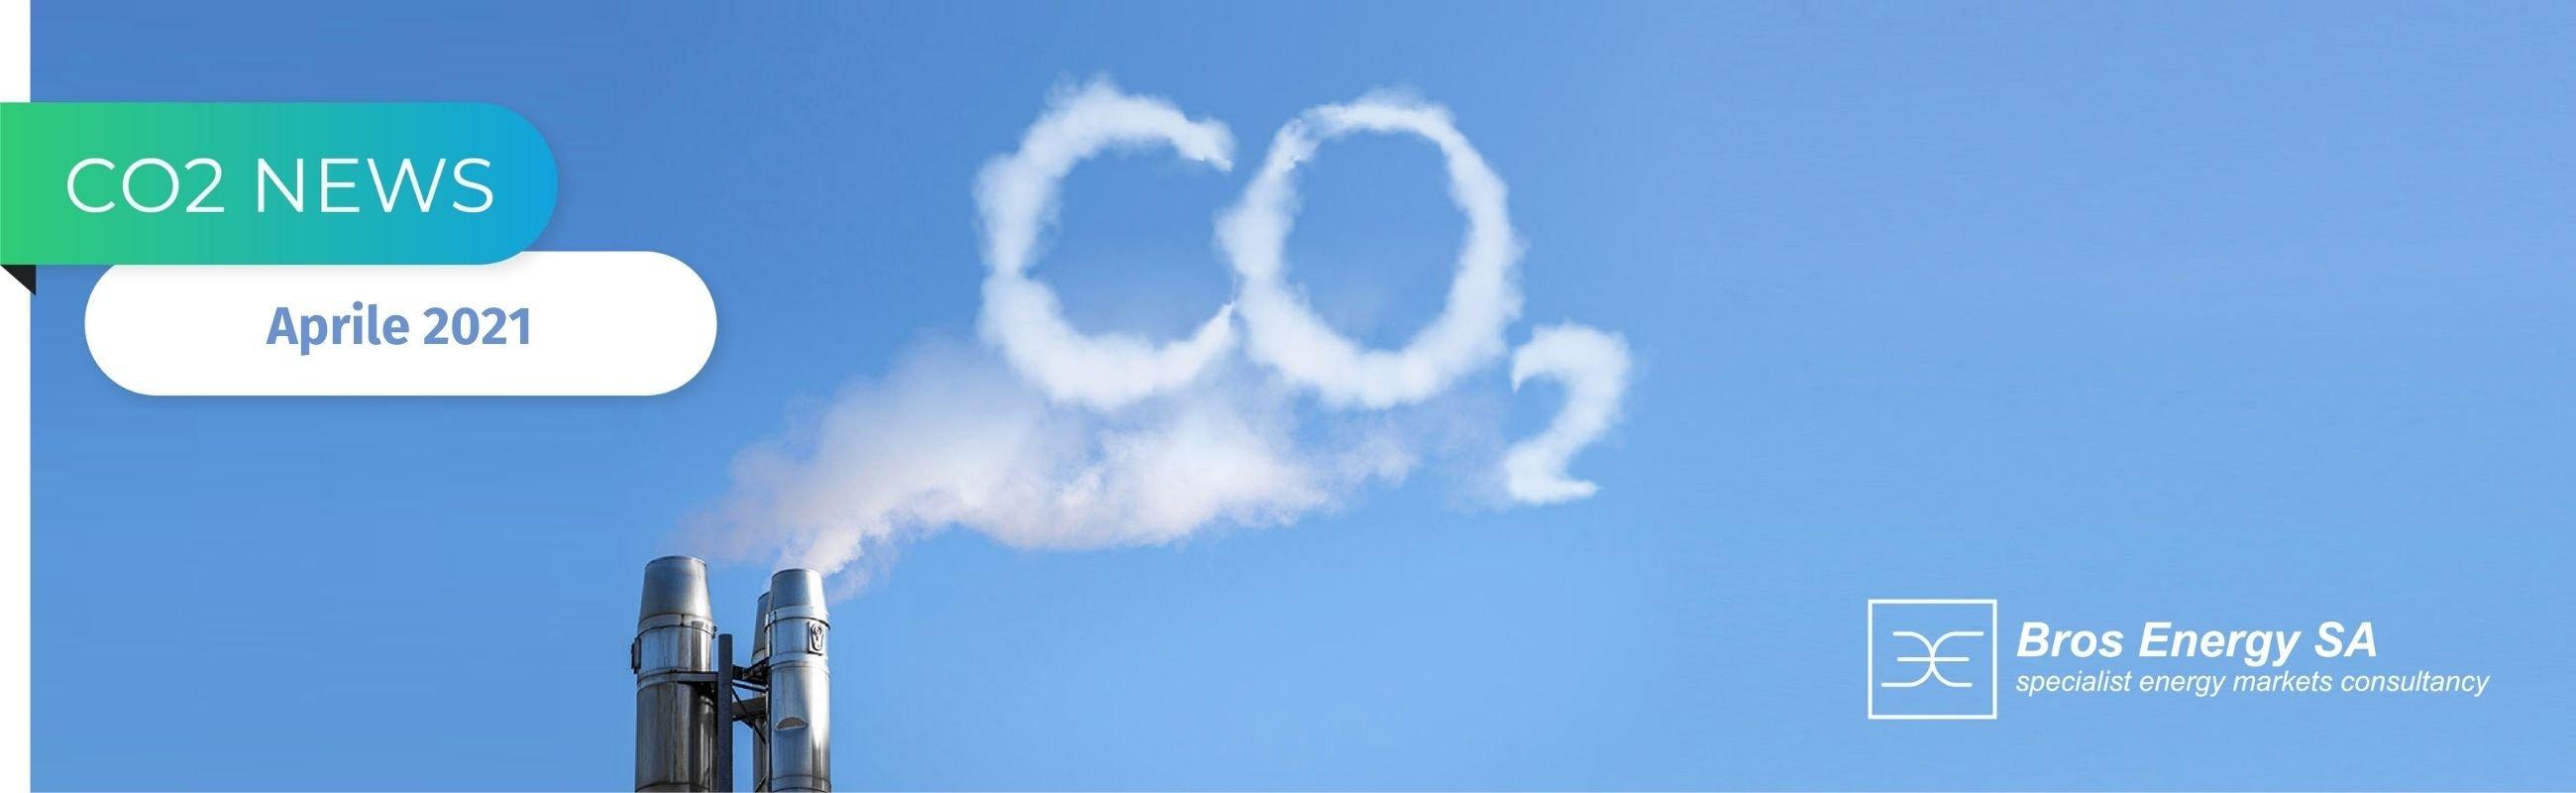 IT-CO2 news-DETAIL (1)